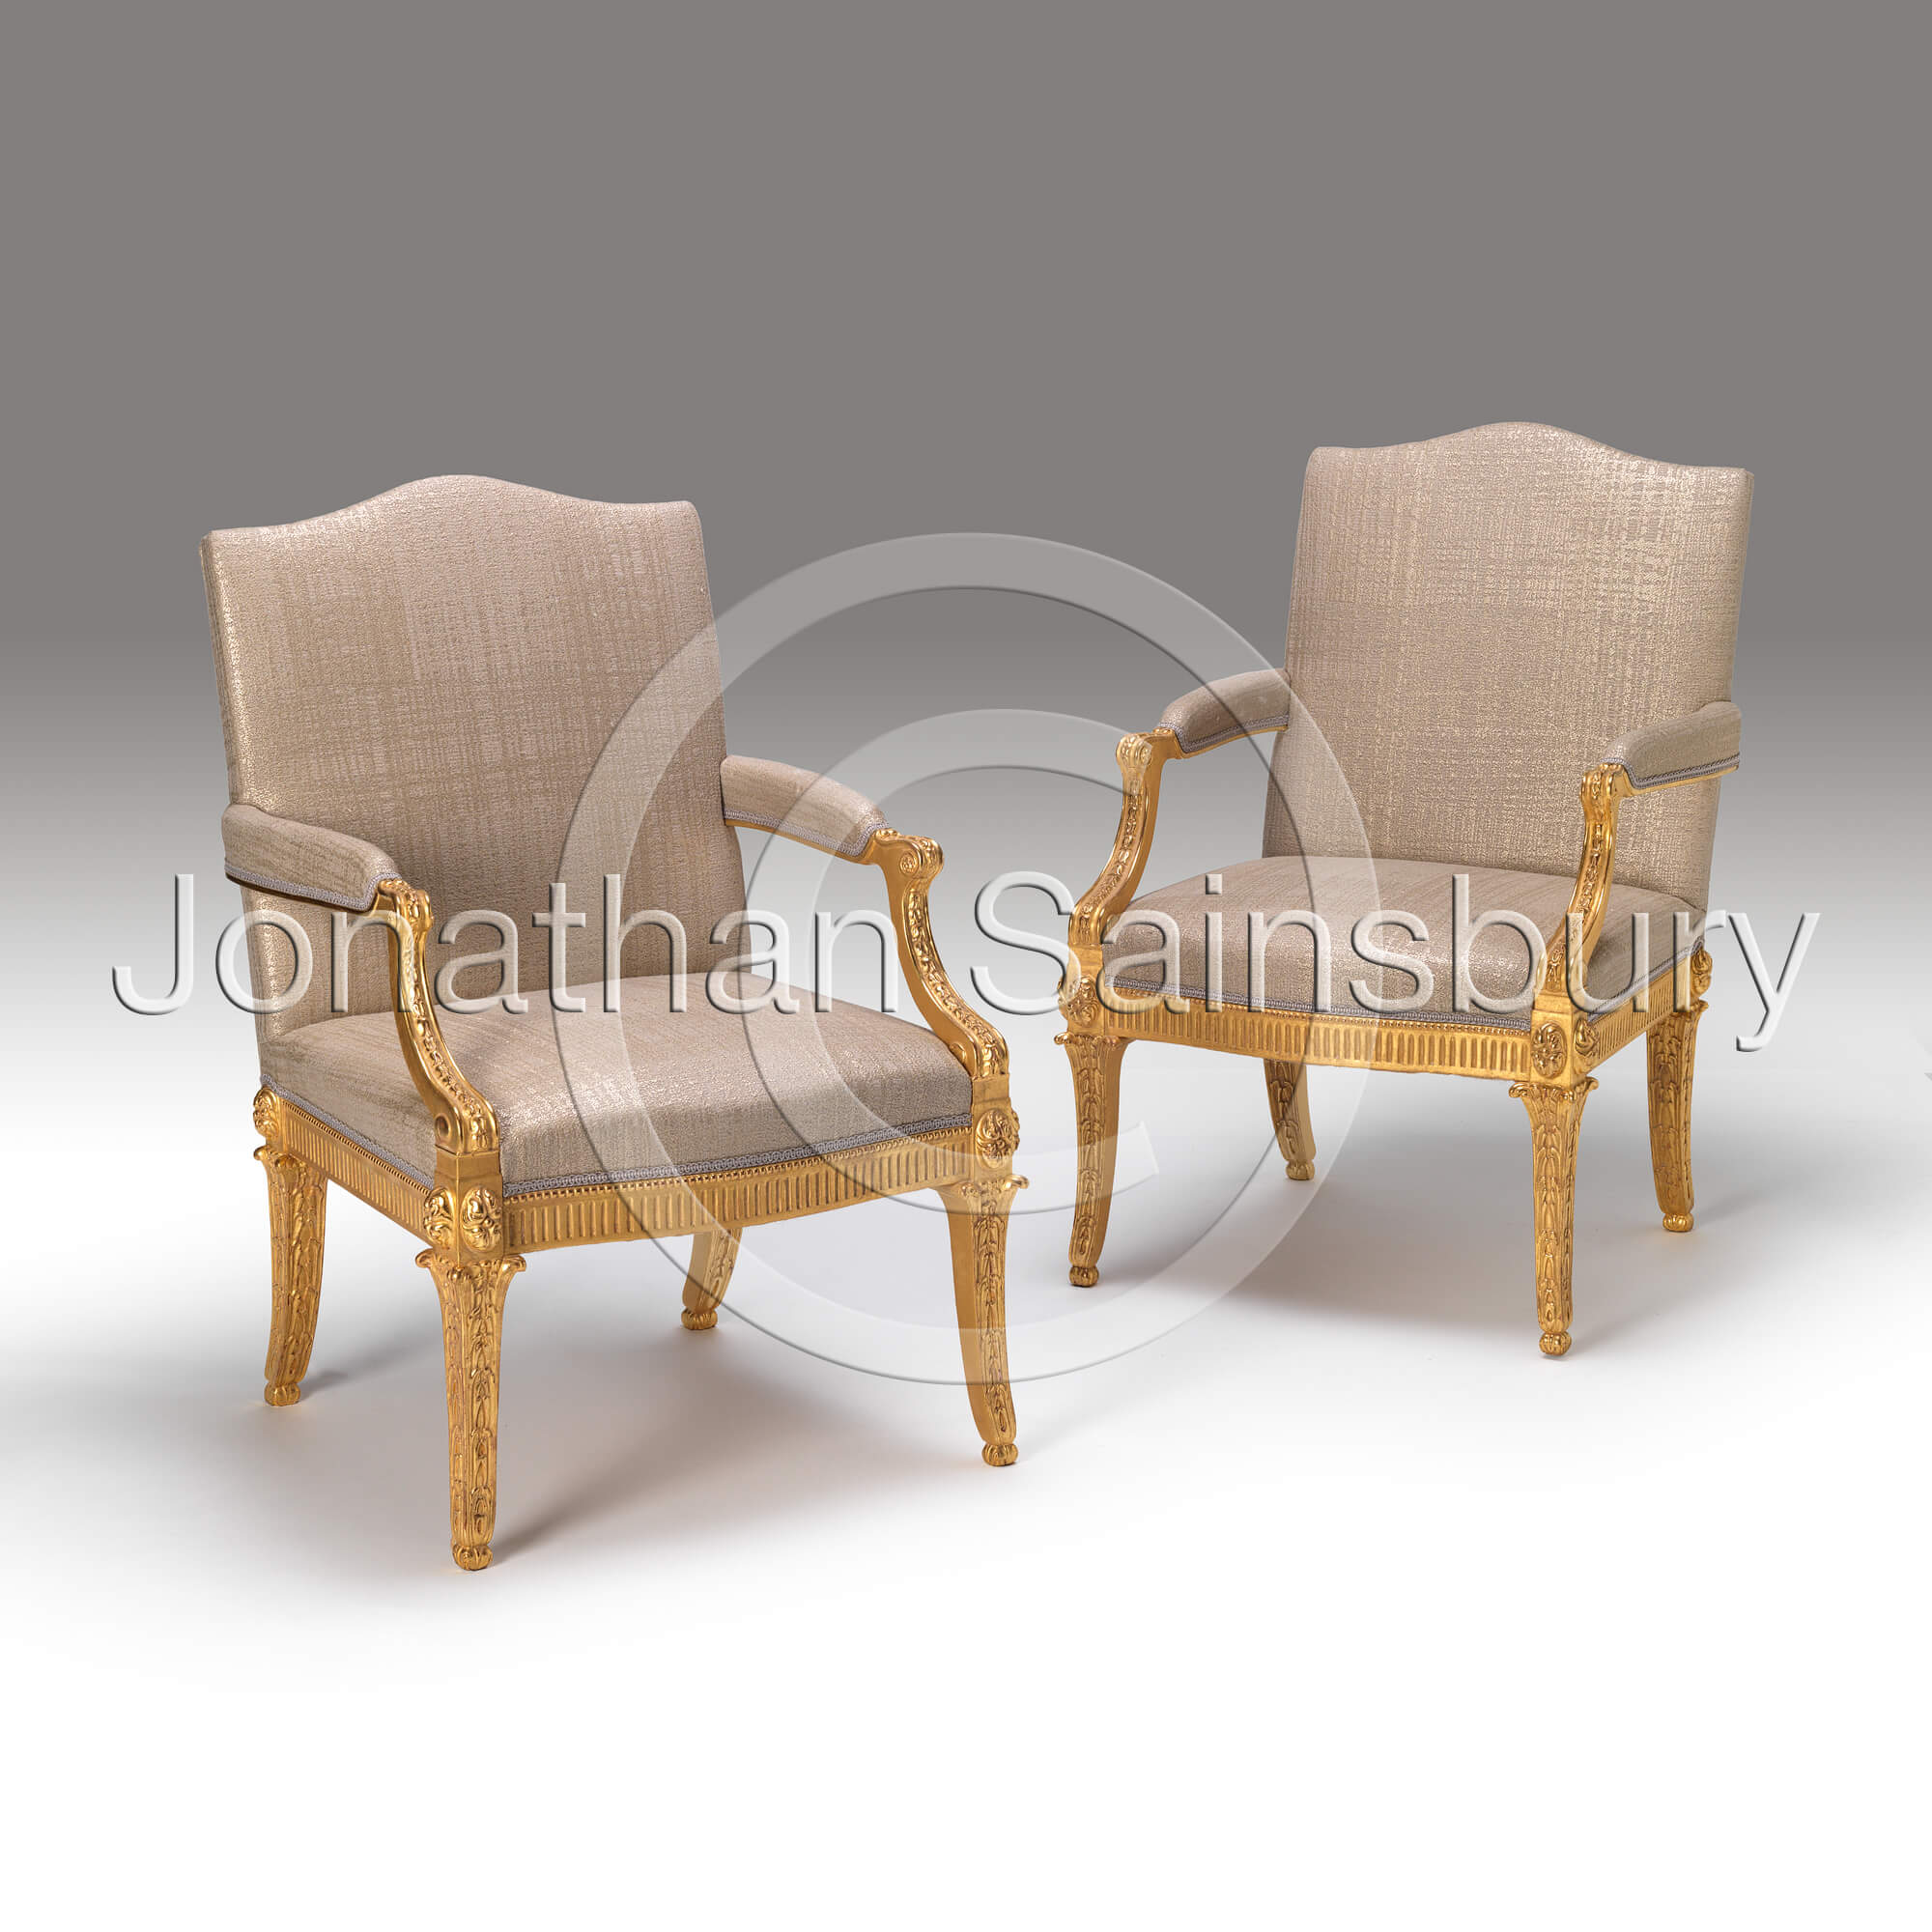 hardwick chair jonathan sainsbury. Black Bedroom Furniture Sets. Home Design Ideas